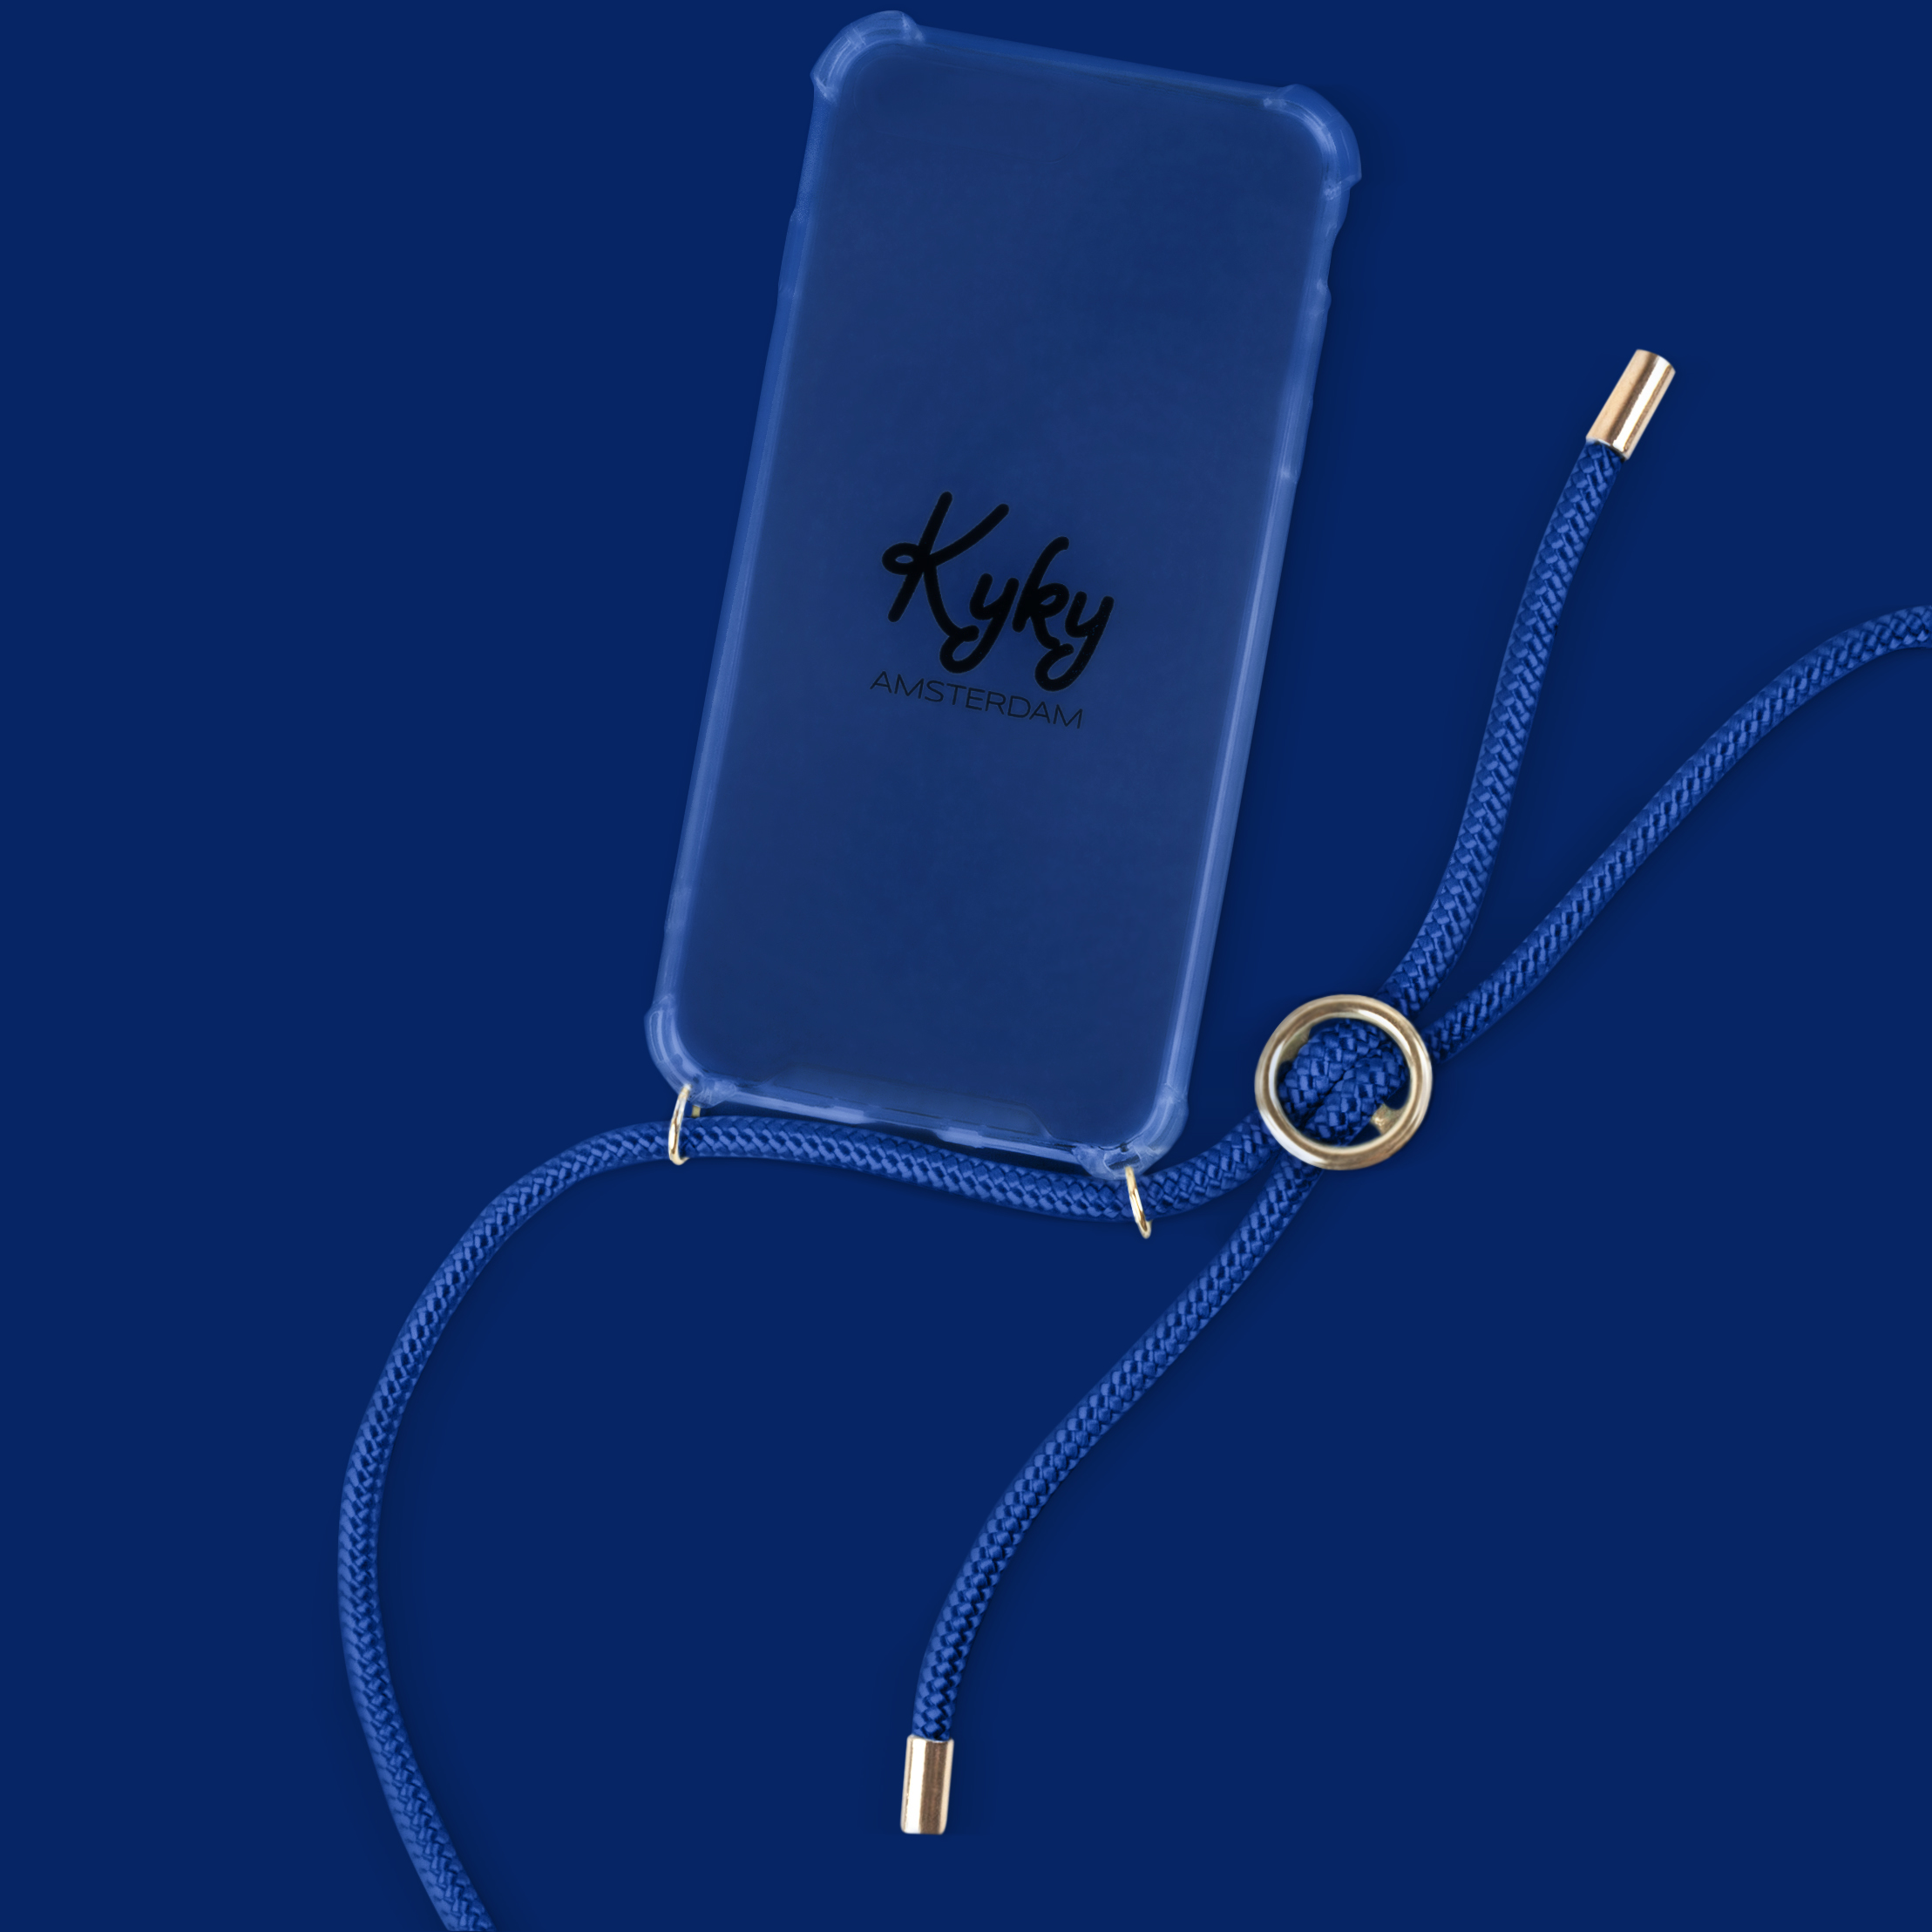 KYKY-AMSTERDAM-ROYAL BLUE